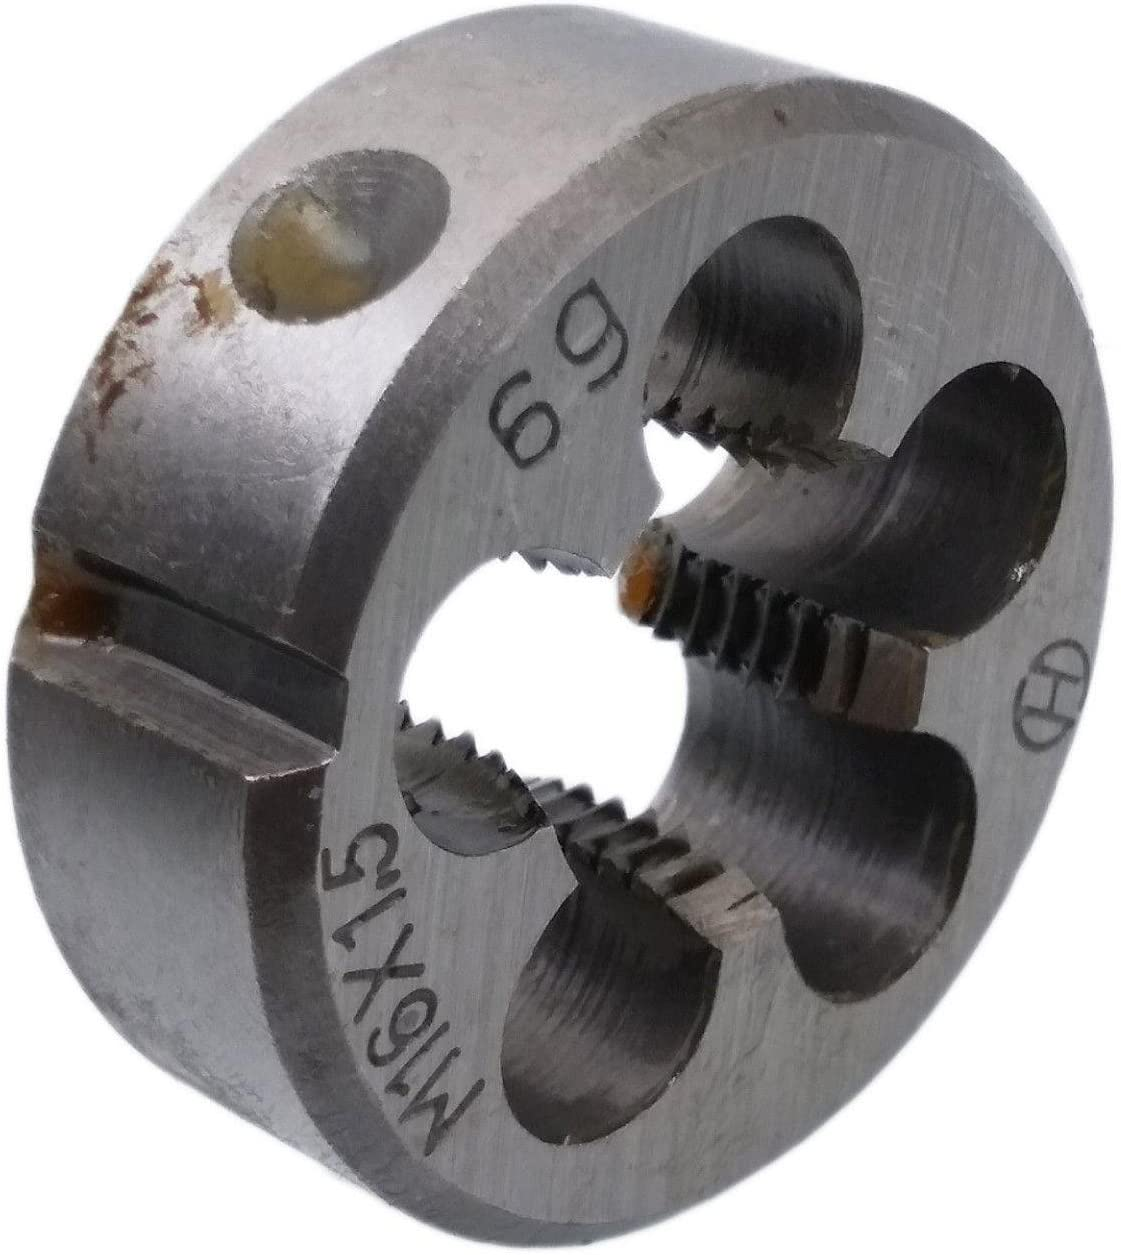 HSS 16mm x 1.5 Metric Die Right Hand Thread M16 x 1.5mm Pitch